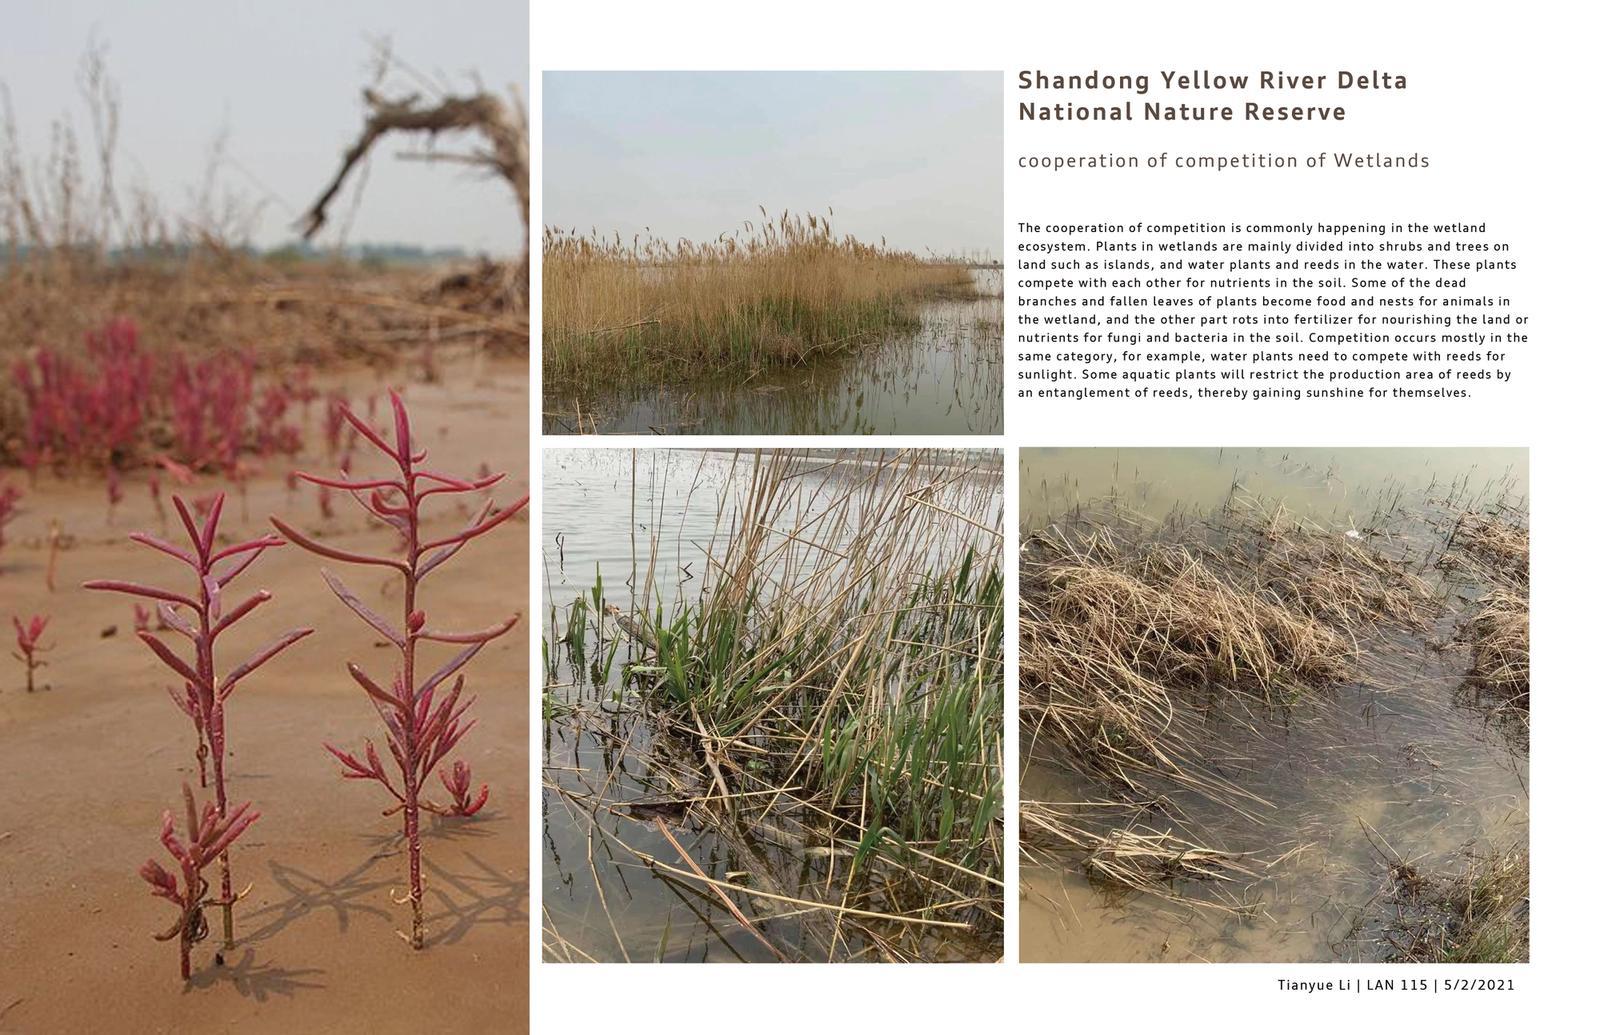 Shandong Yellow River Delta National Nature Reserve 6